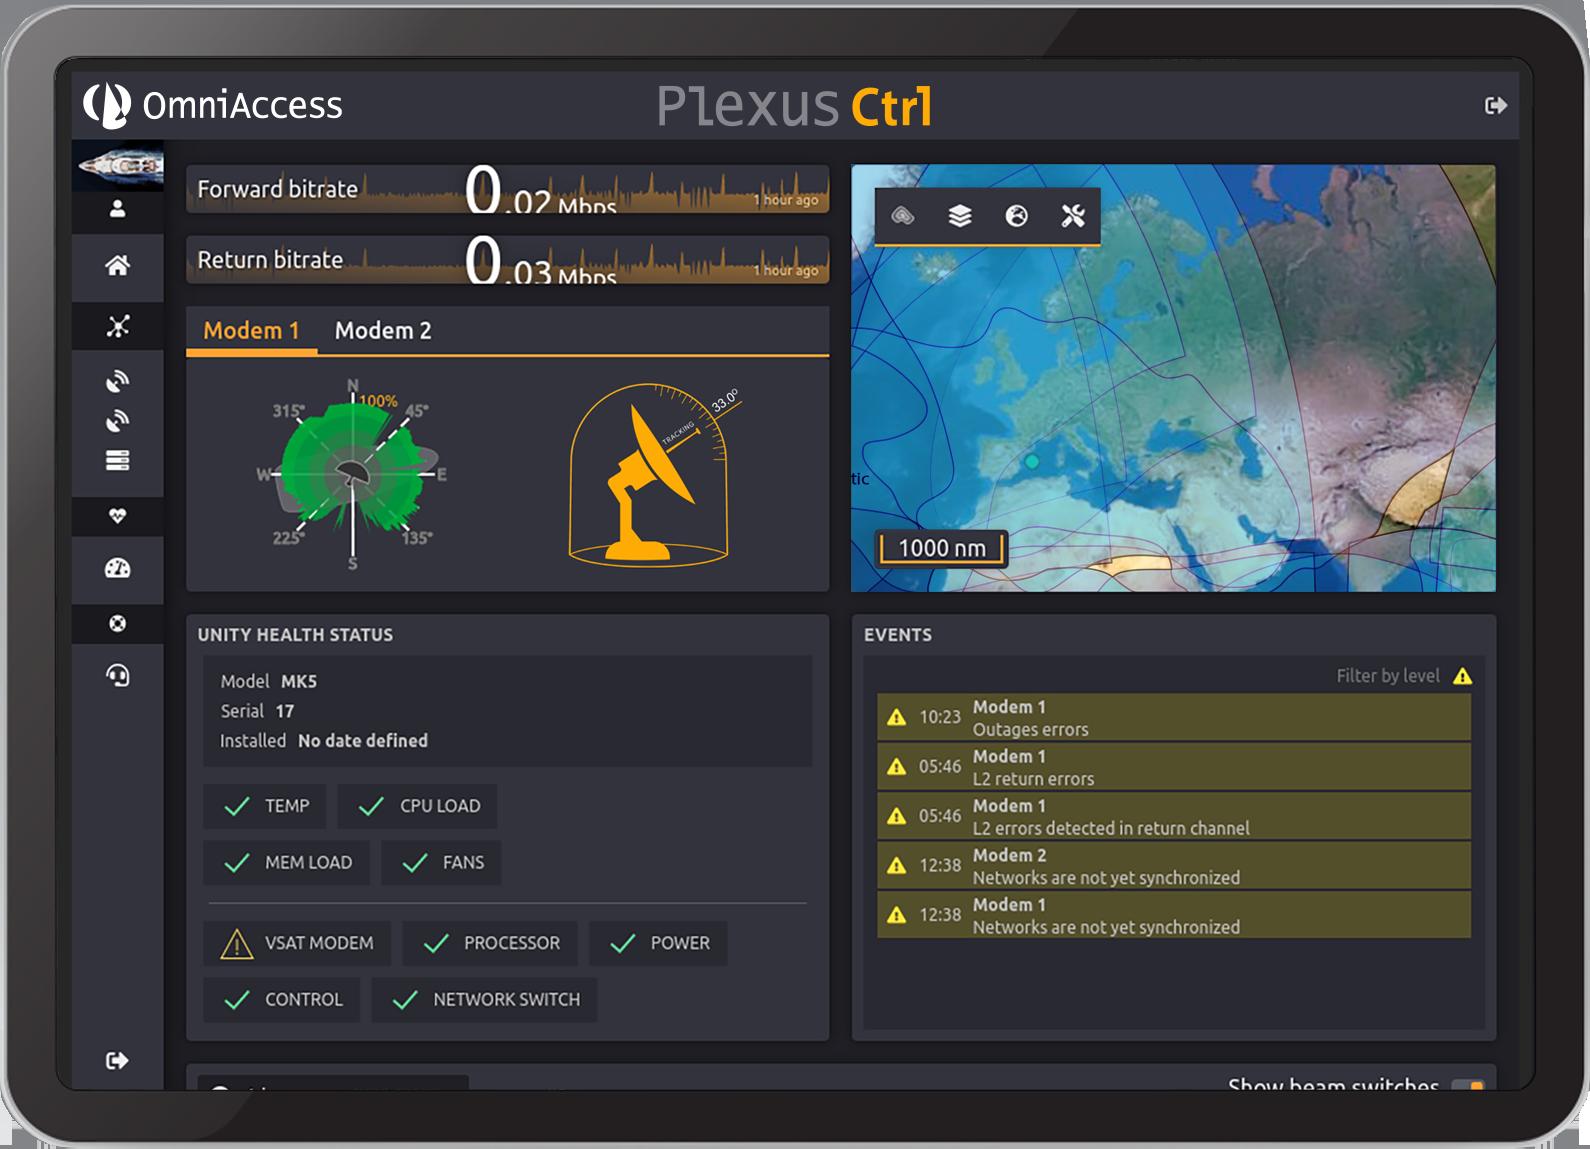 OmniAccess Plexus